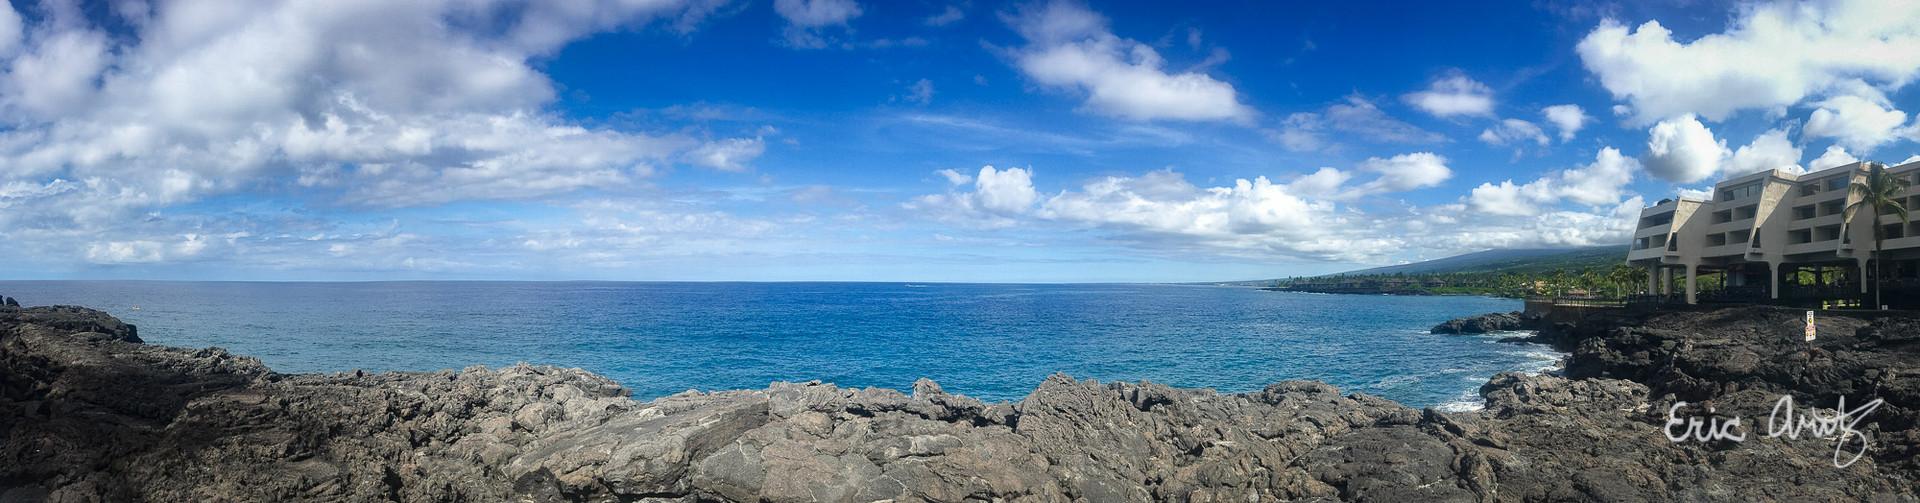 Sheraton, West Maui